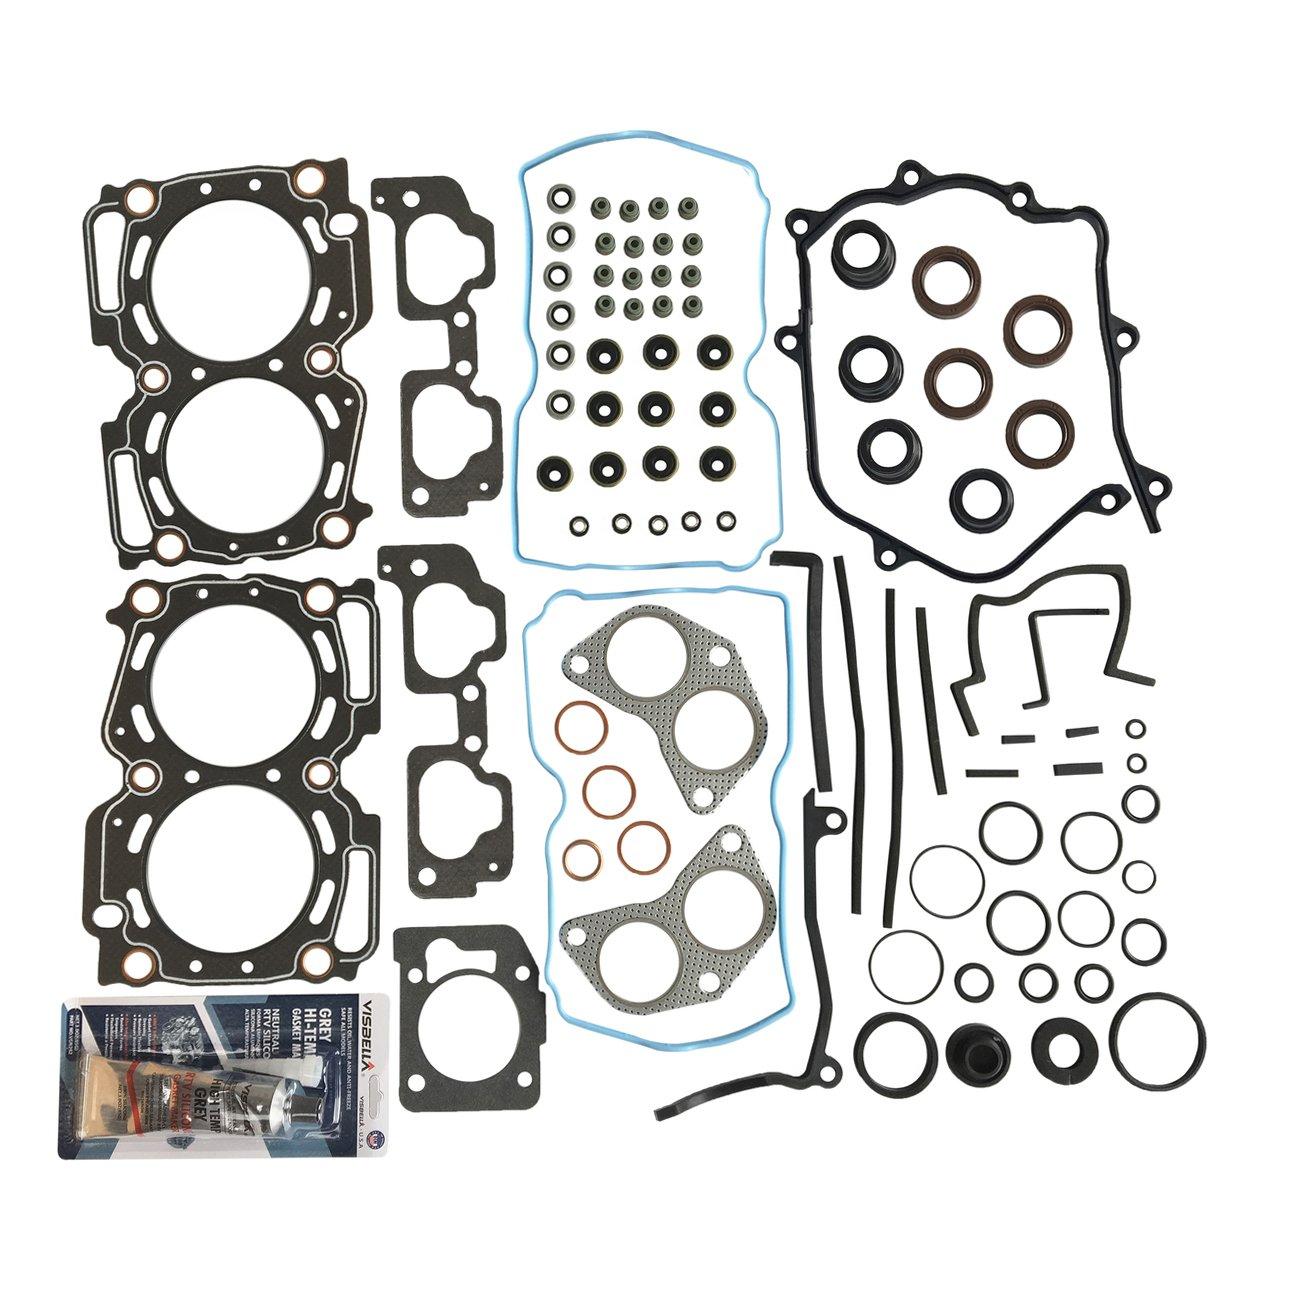 SKP HS26170PT1 Head Gasket Set, 1 Pack